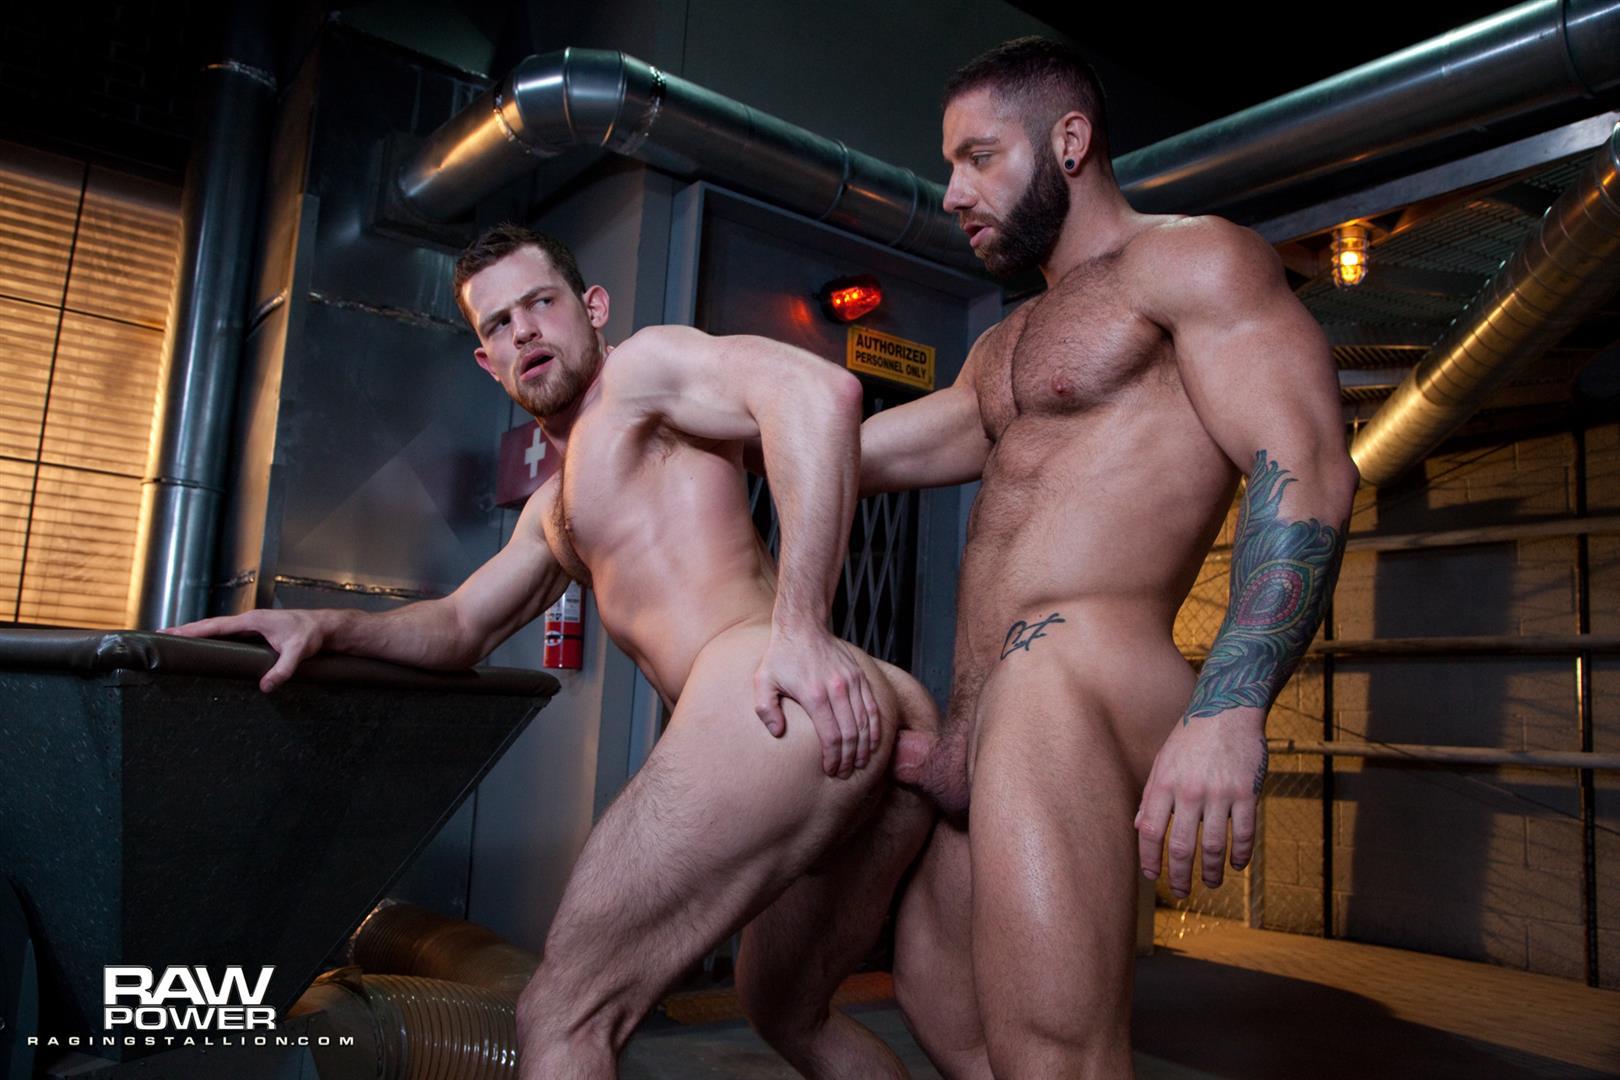 Nasty dirty sex raging stallion